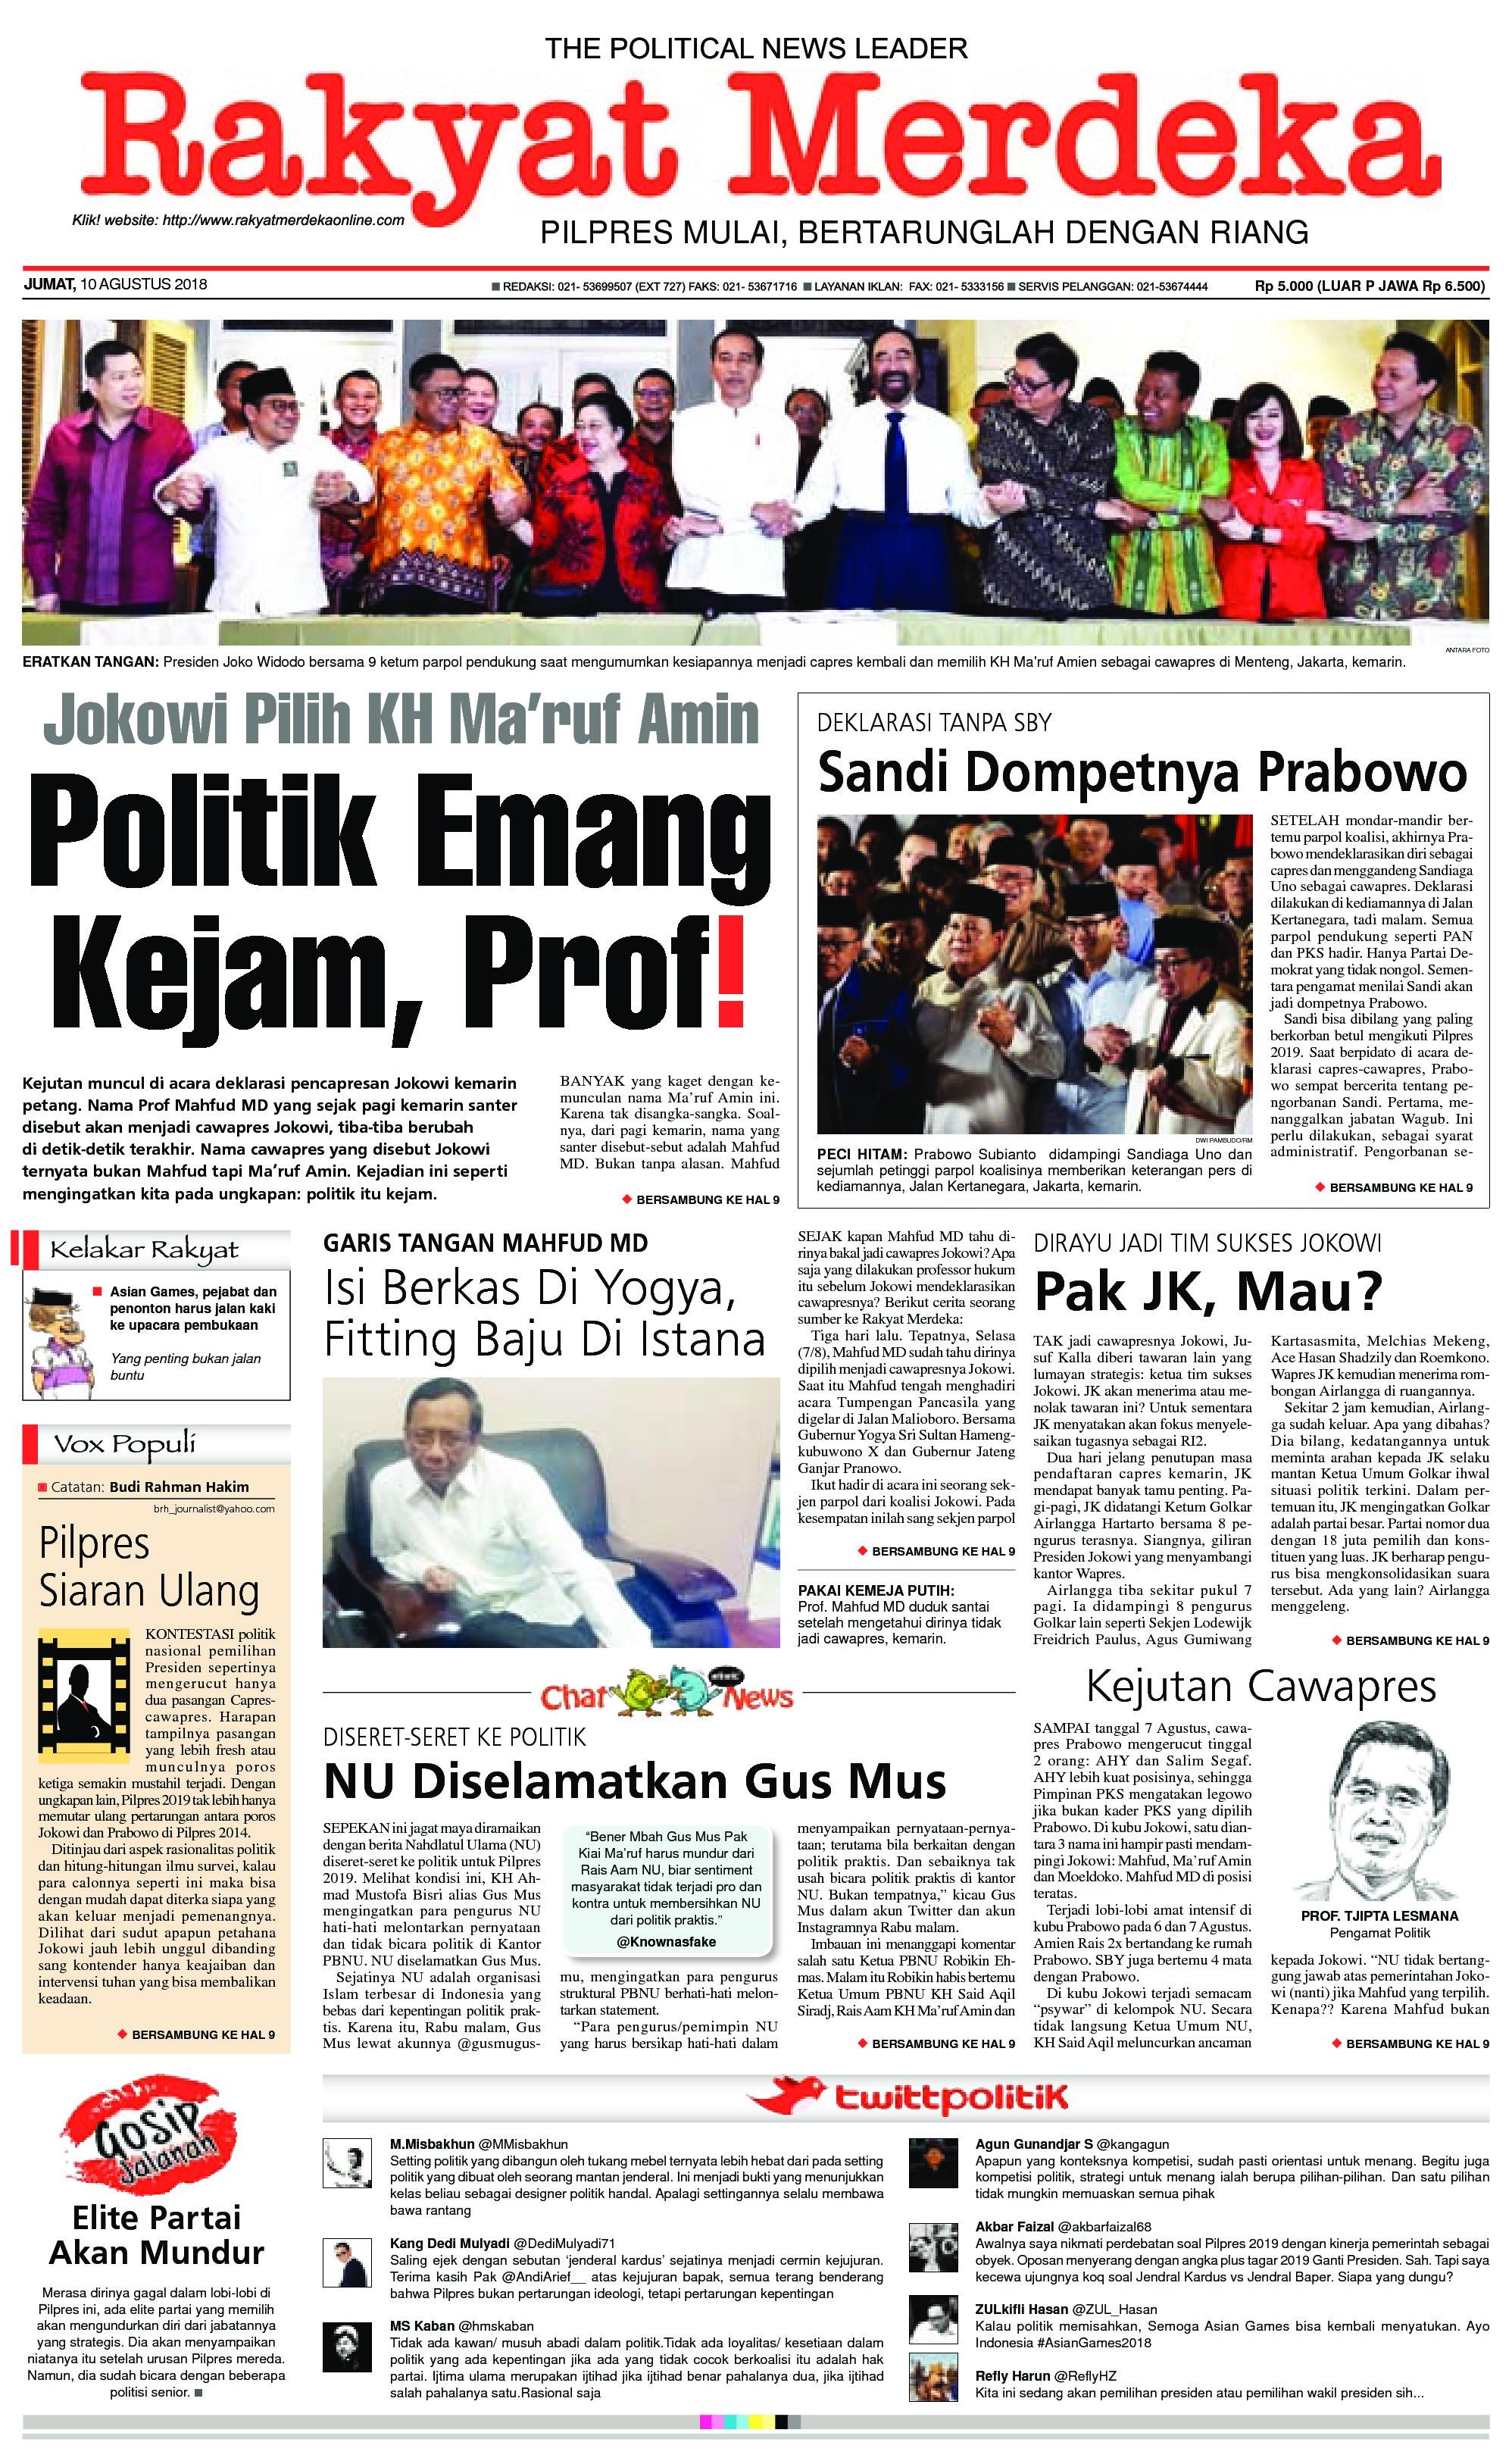 Rakyat Merdeka Newspaper 10 August 2018 Gramedia Digital Jendral Kardus